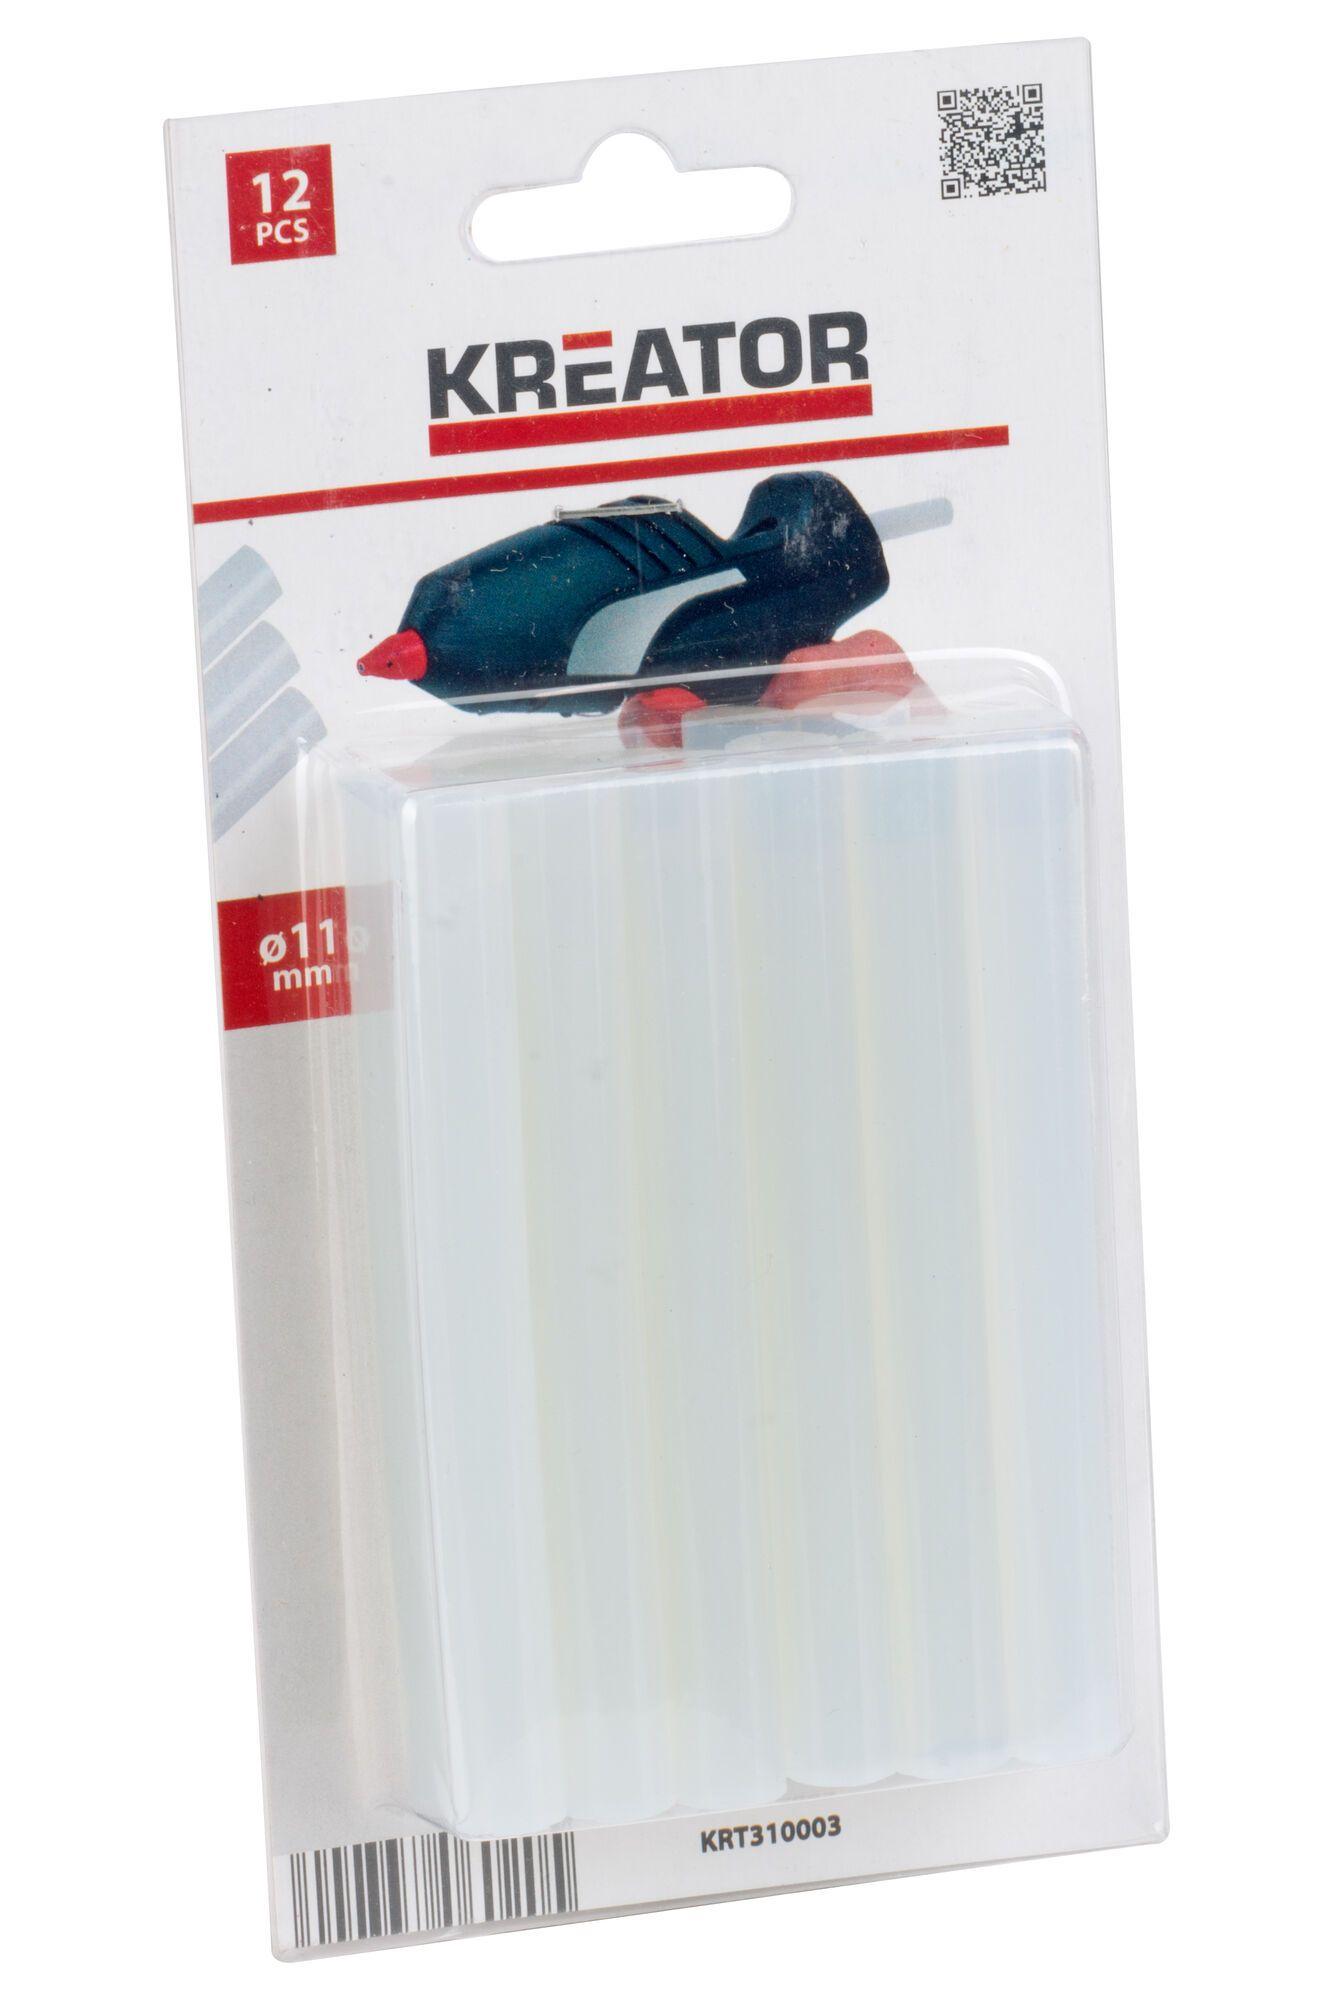 Kreator KRT310003 12 Lijmsticks voor lijmpistool   11 mm gluesticks